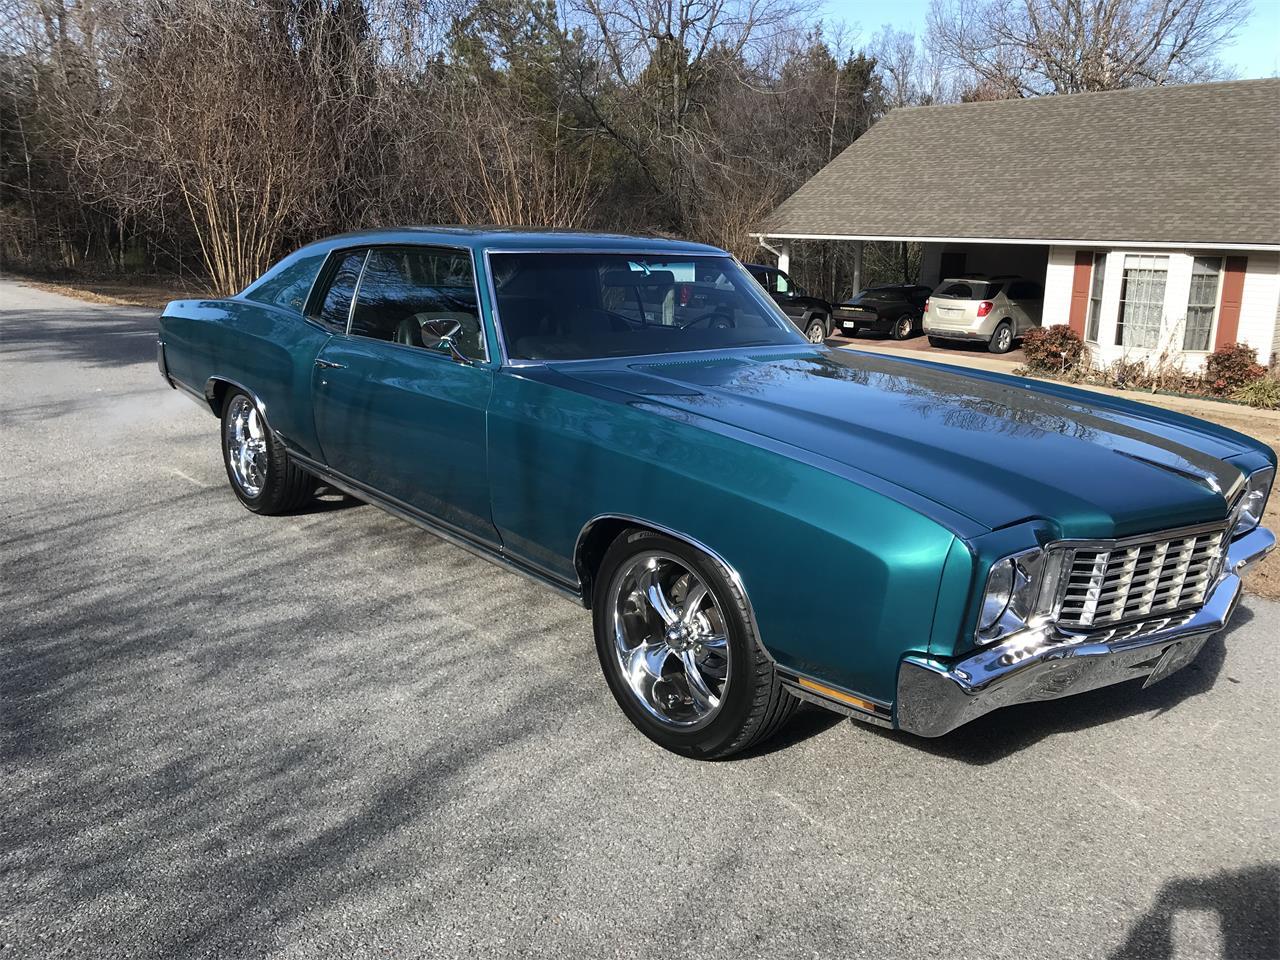 Chevrolet Dealers In Arkansas >> 1972 Chevrolet Monte Carlo for Sale | ClassicCars.com | CC-1058098